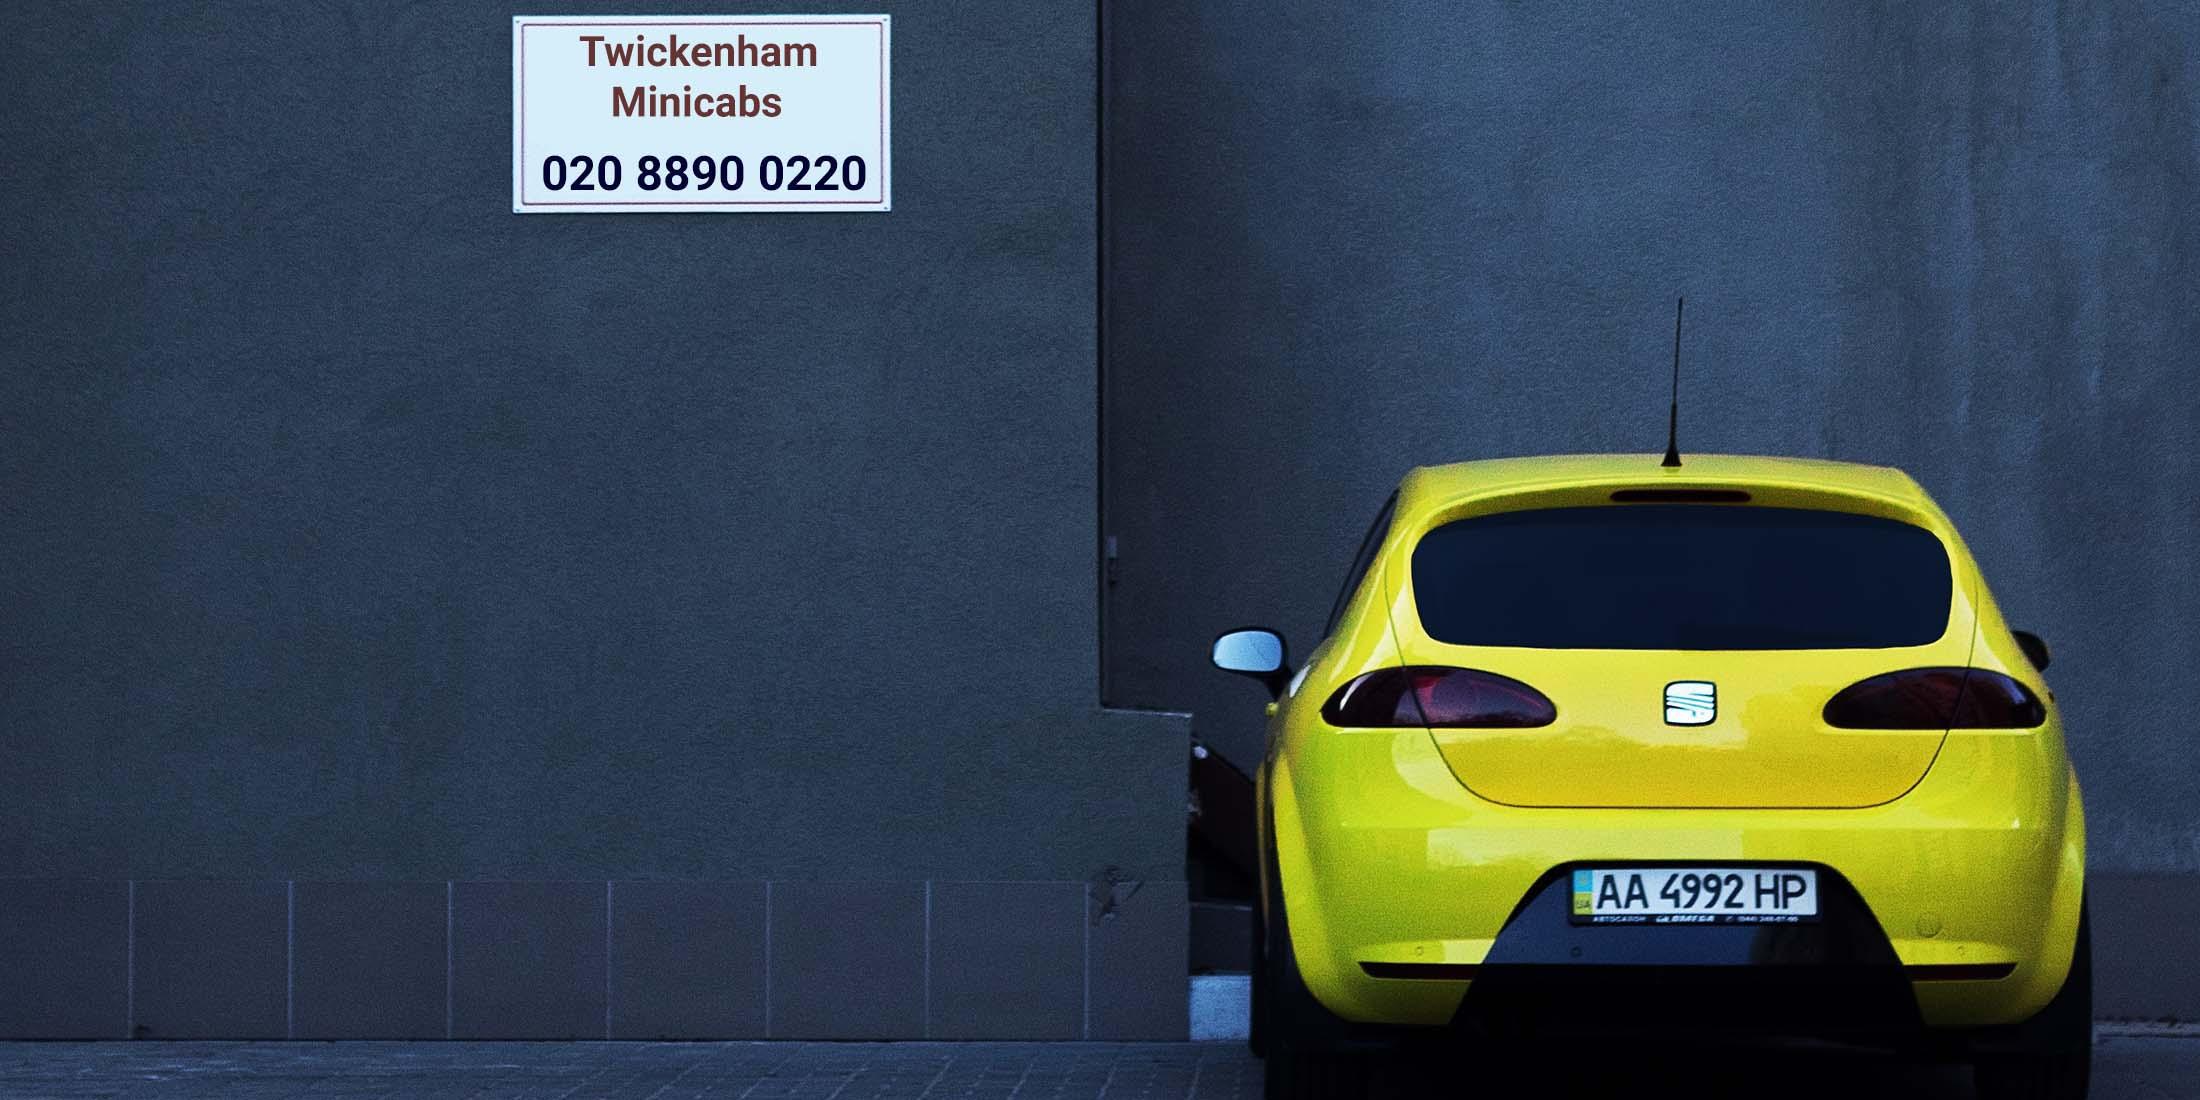 Twickenham Mincabs - Taxi to Twickenham at cheap rates